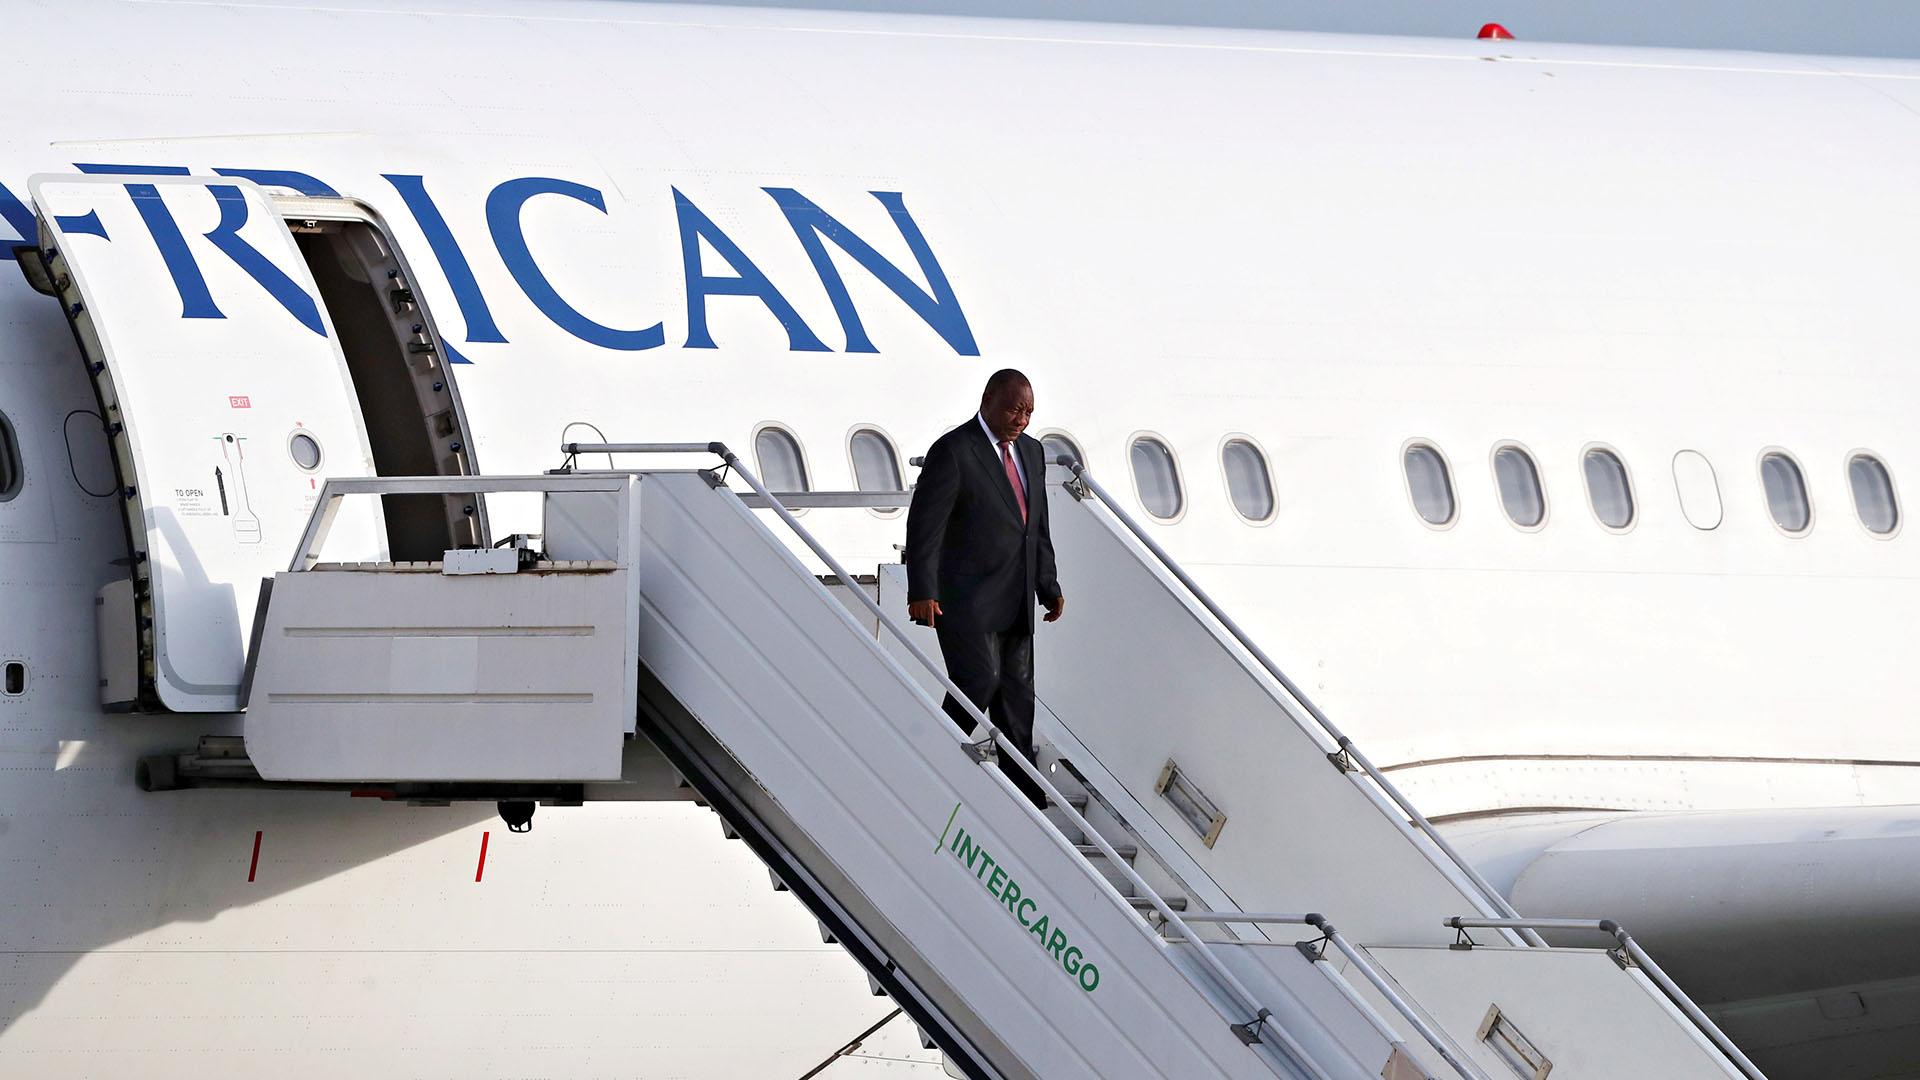 El presidente de Sudáfrica Cyril Ramaphosa